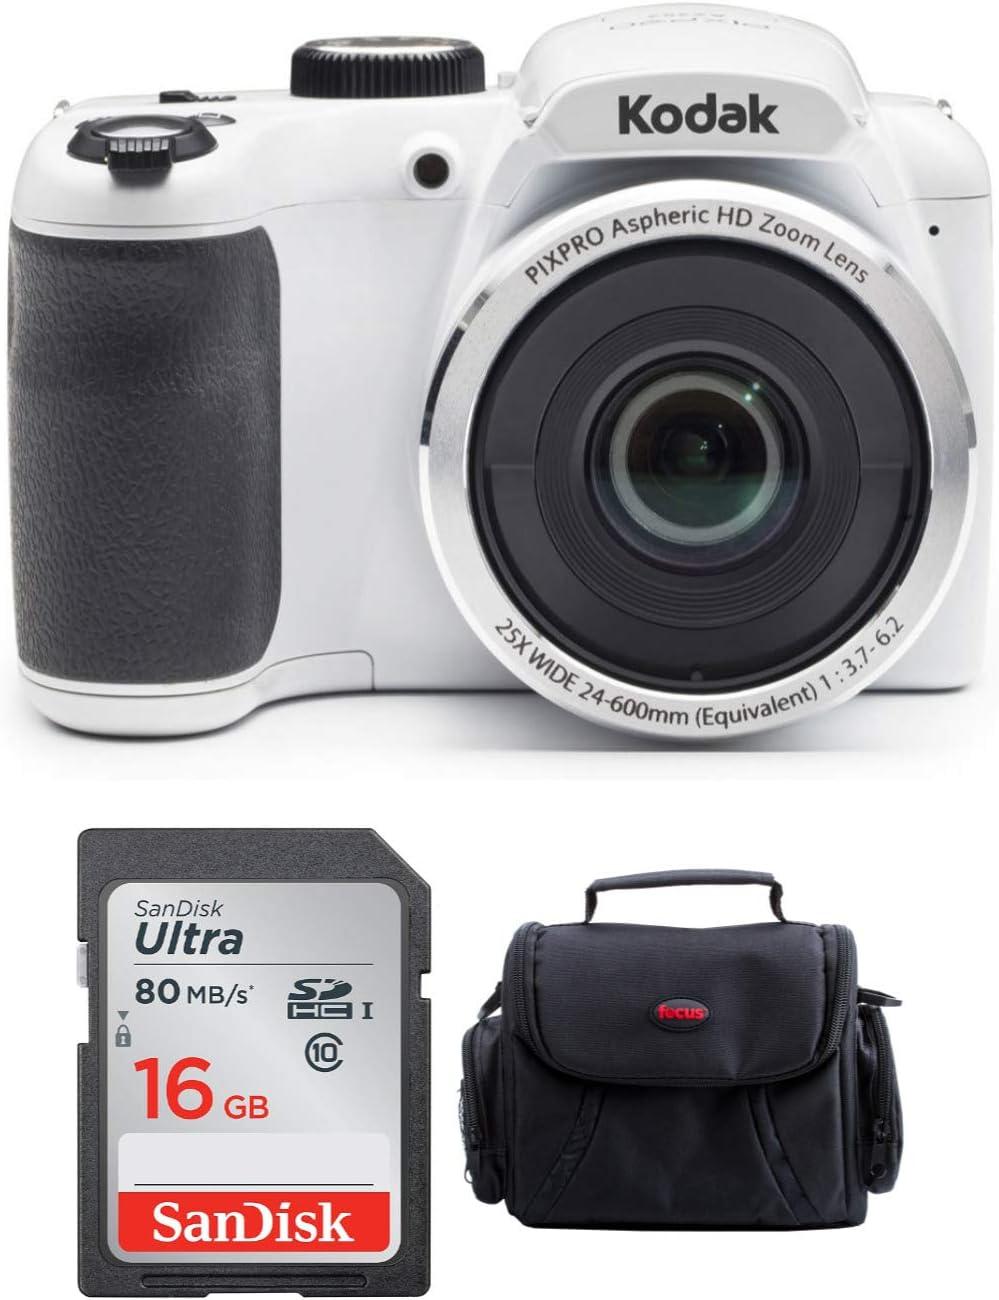 2 Items Kodak PIXPRO WPZ2 Rugged Waterproof 16MP Digital Camera with 4X Optical Zoom and Kodak 32GB microSDHC Card with Adapter Bundle